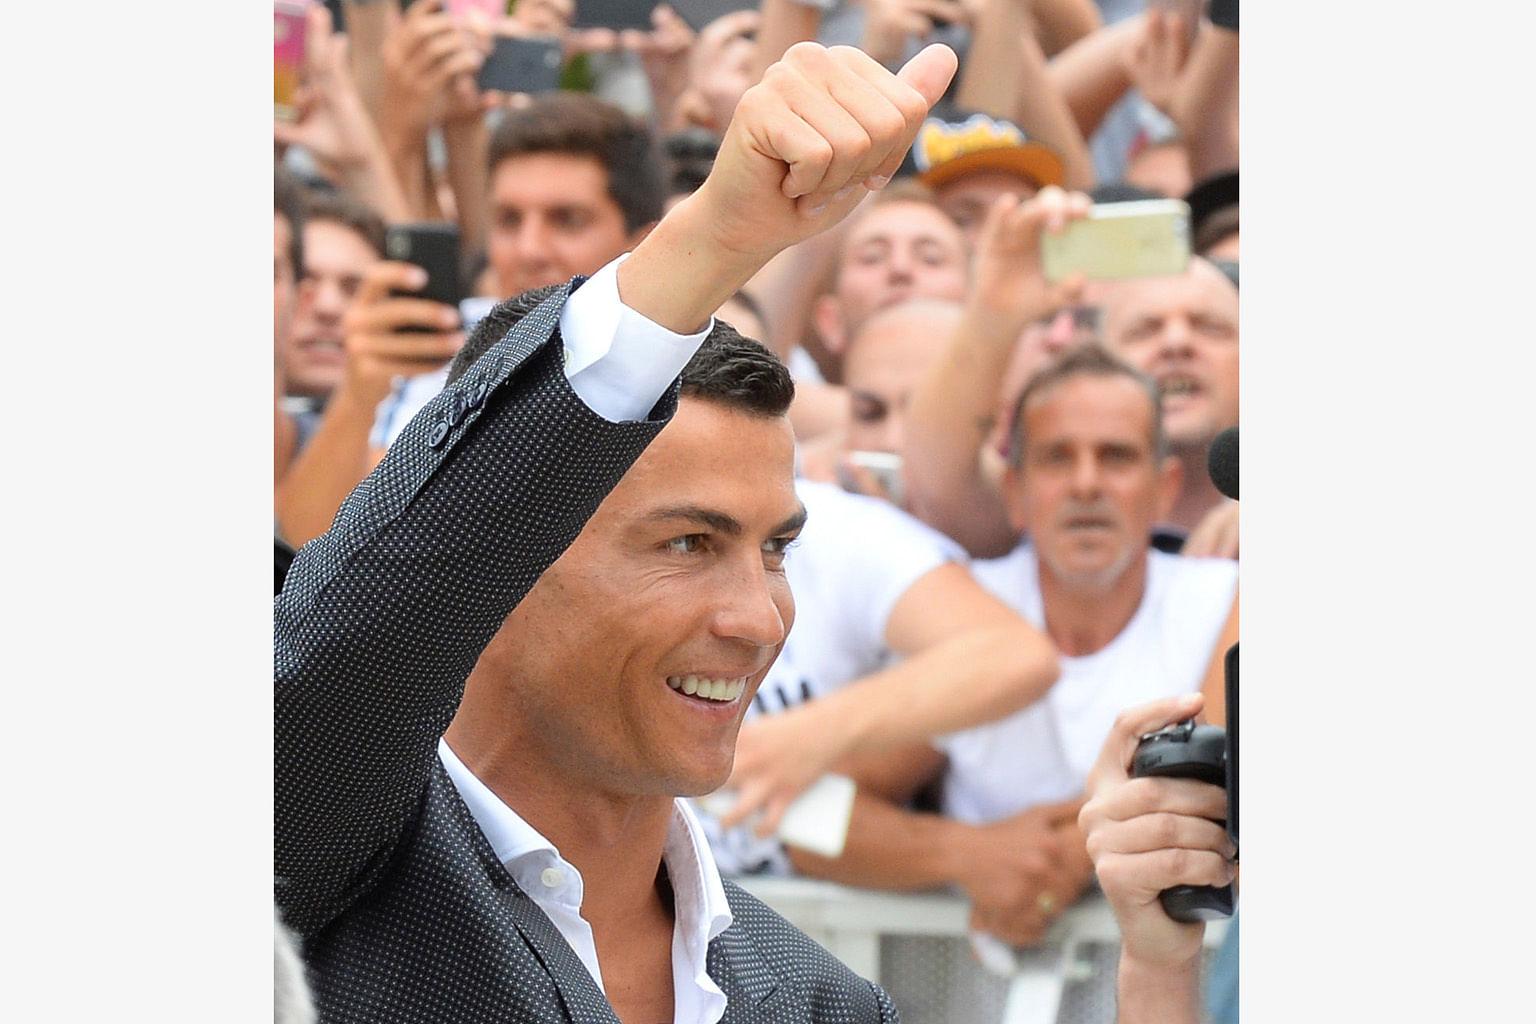 PEMINDAHAN PEMAIN BOLA SEPAK EROPAH Langkah Ronaldo ke Juventus, mendepani cabaran 'The Old Lady'